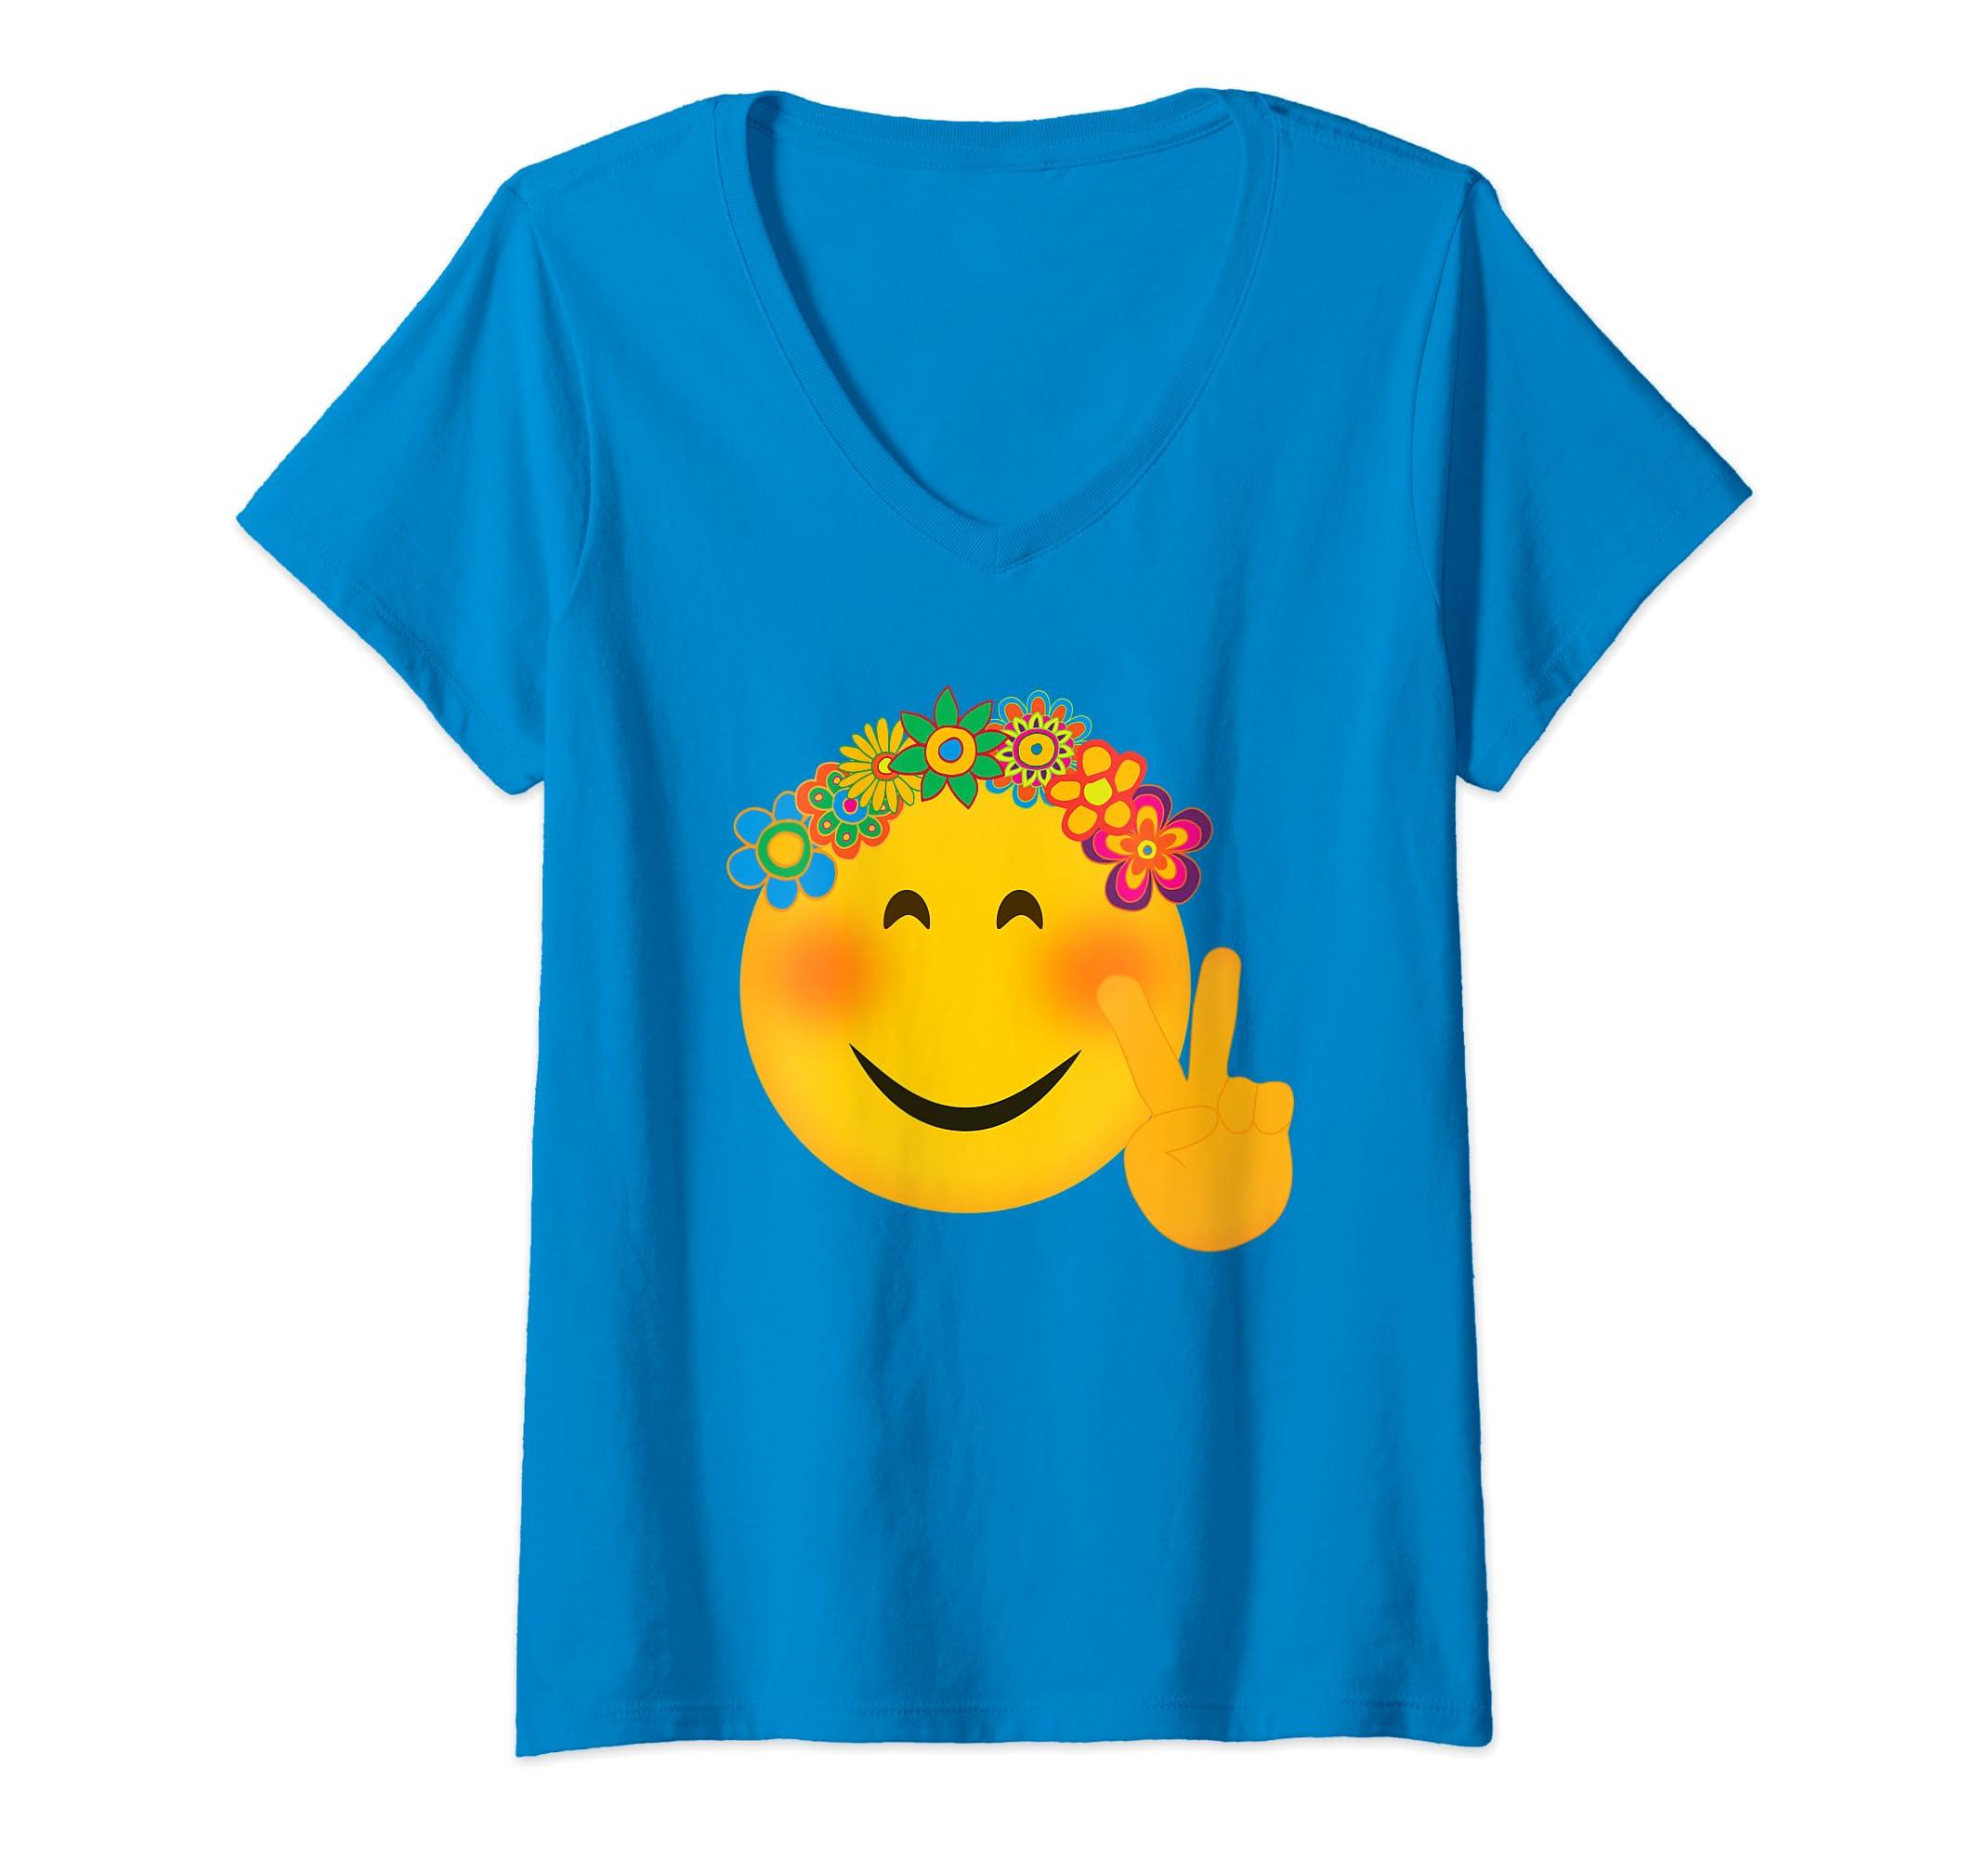 Amazon com: Womens Hippie Emoji TShirt Funny Hippy Peace Hand Sign